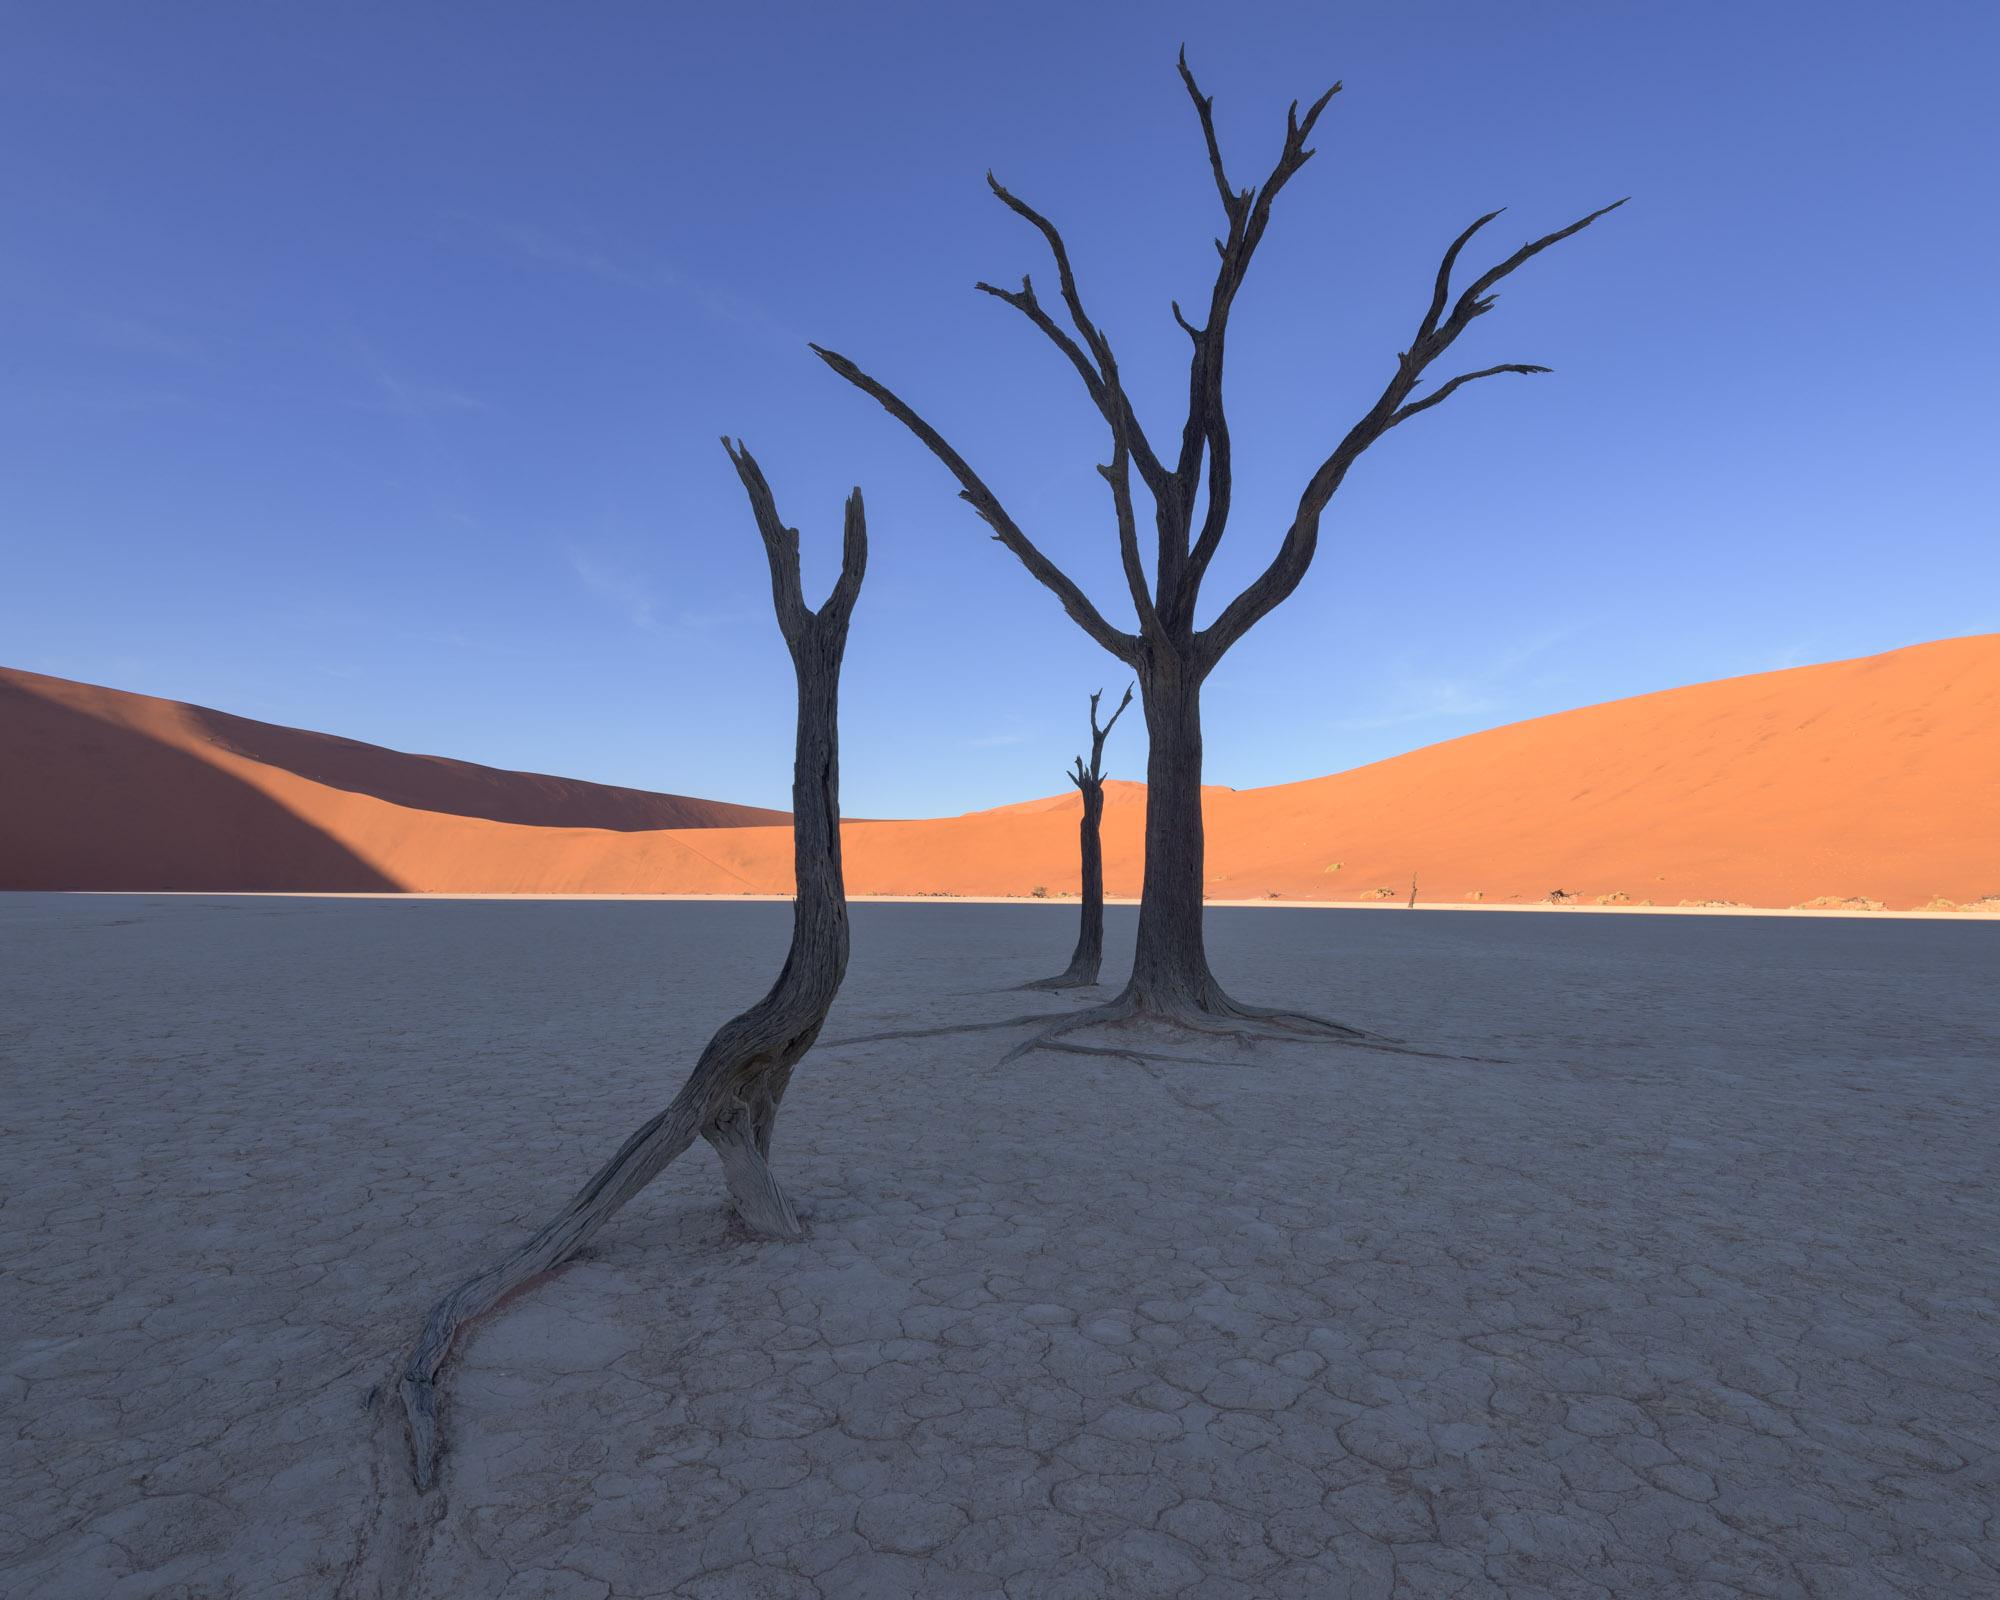 Dead Acacia Trees in Deadvlei, Namibia